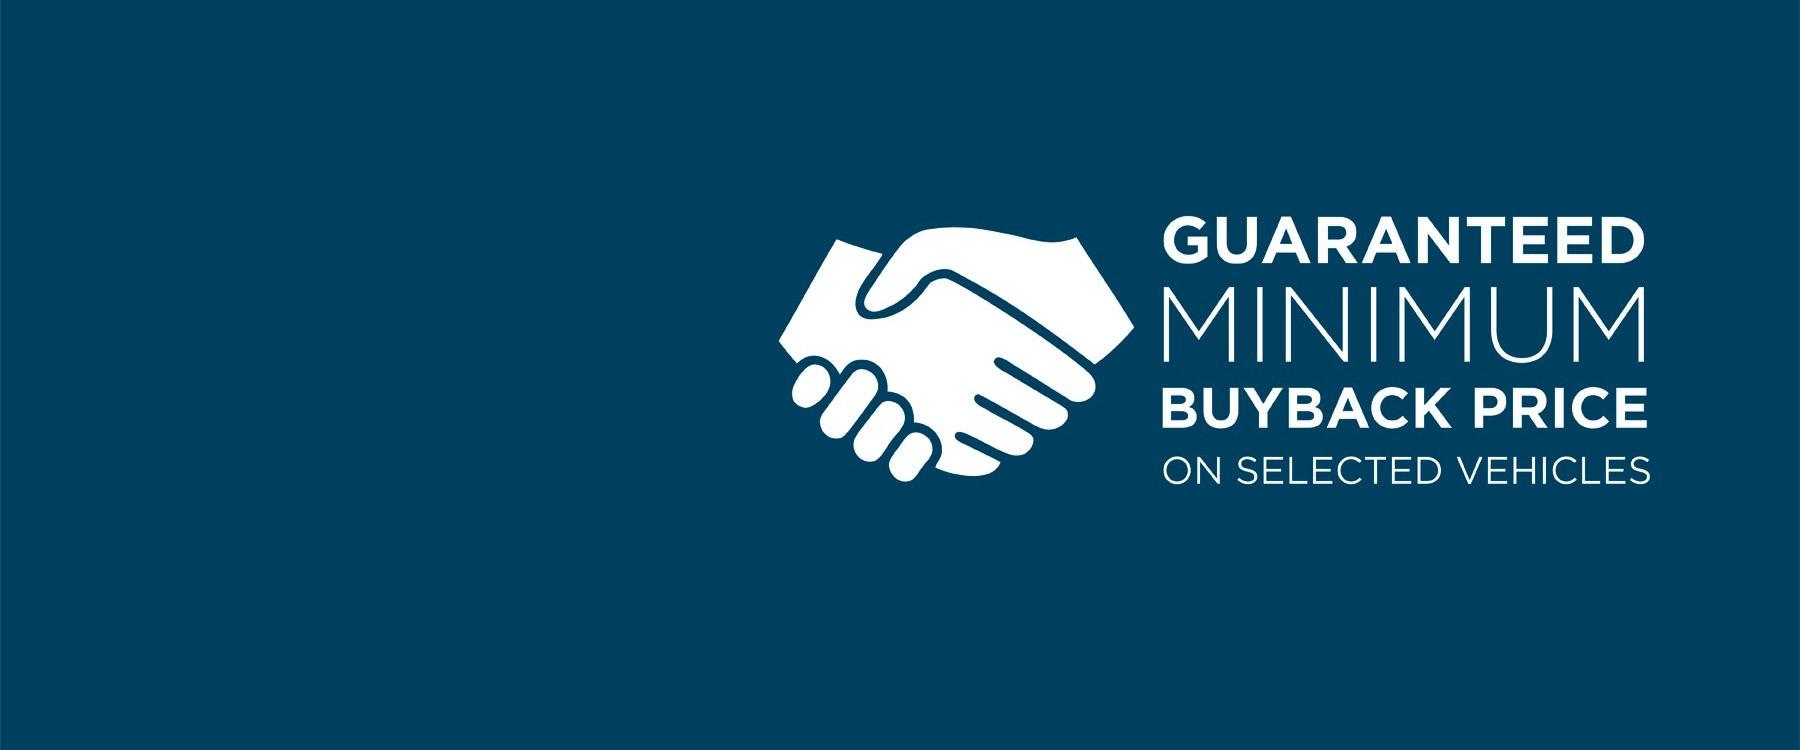 Guaranteed Minimum Buyback Price